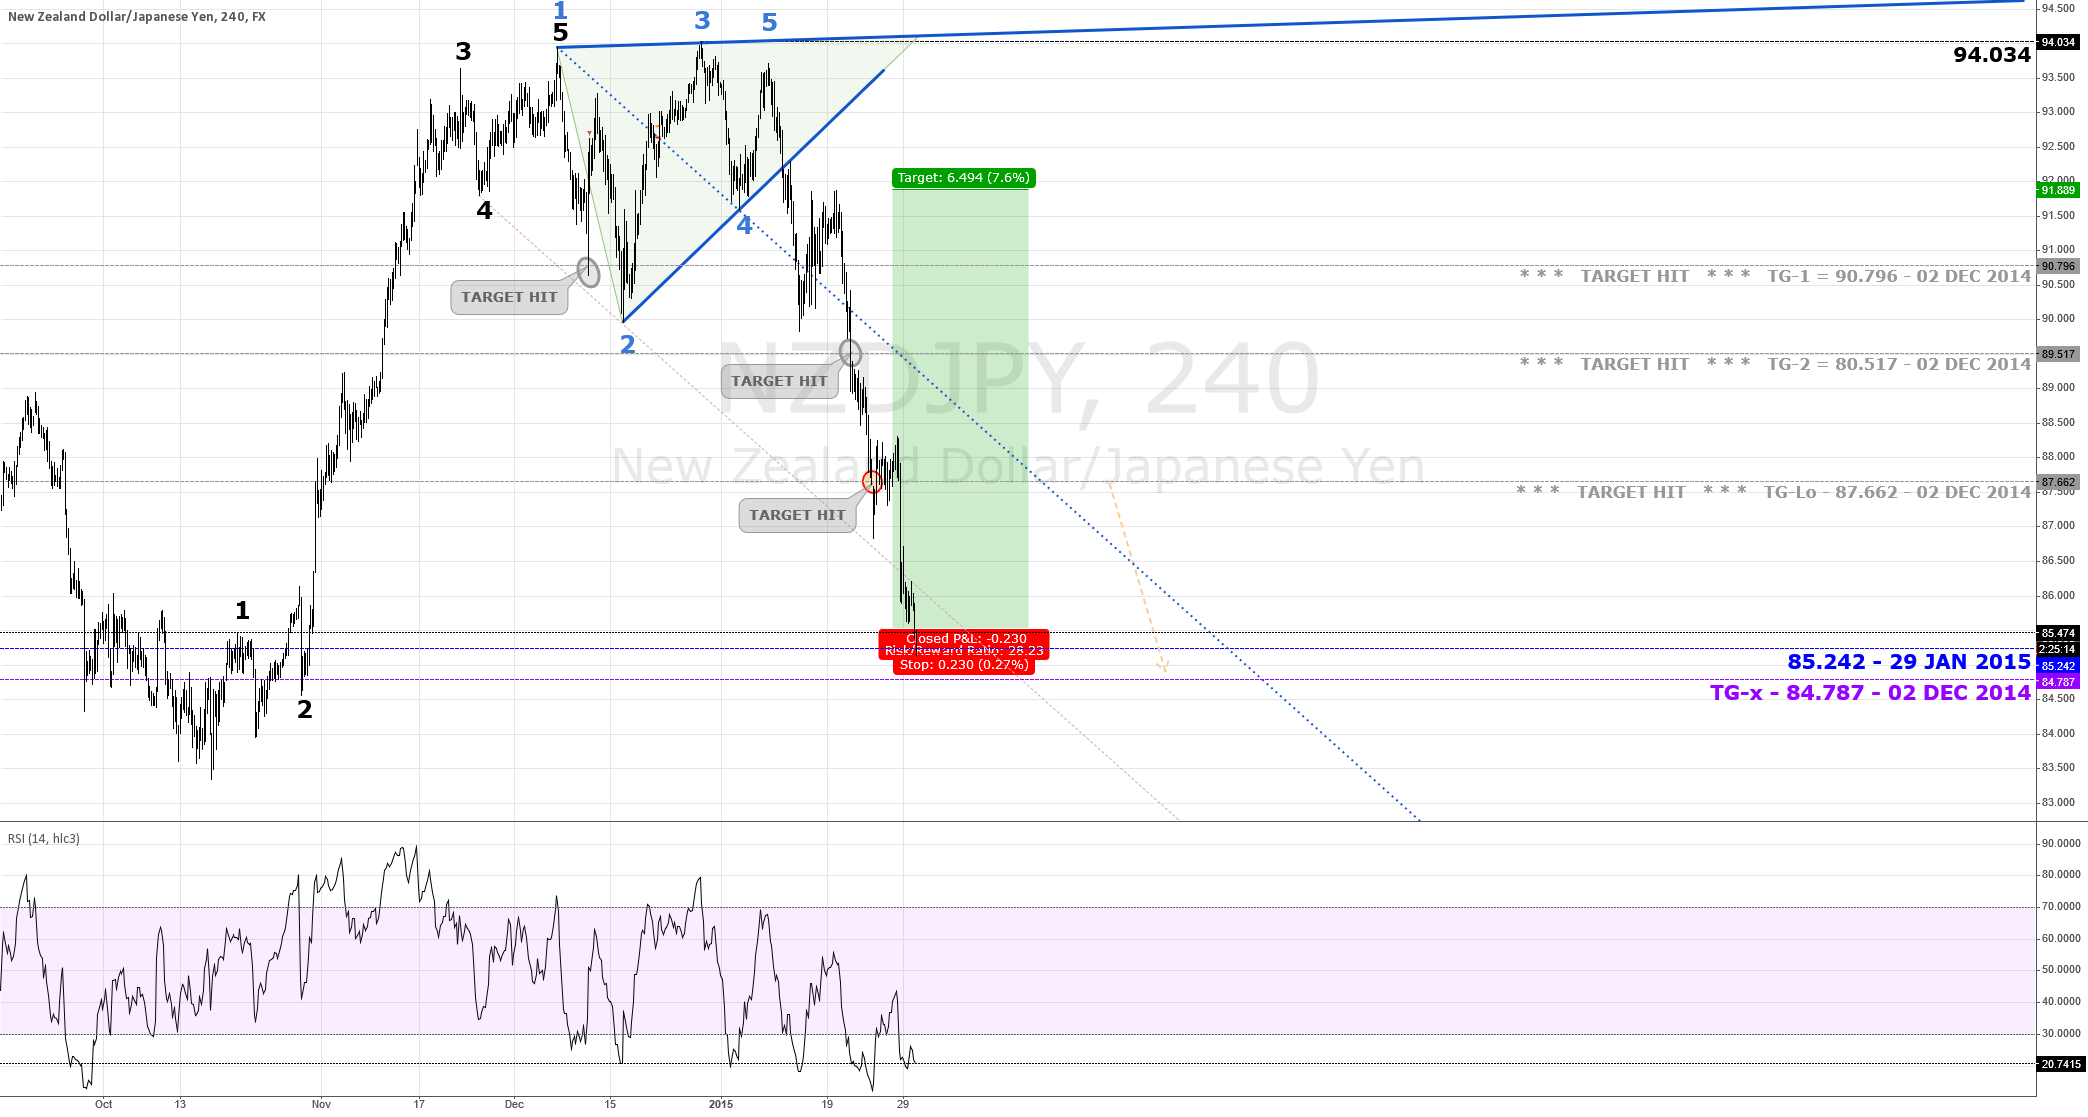 LONG Trade Opp | $NZD $JPY